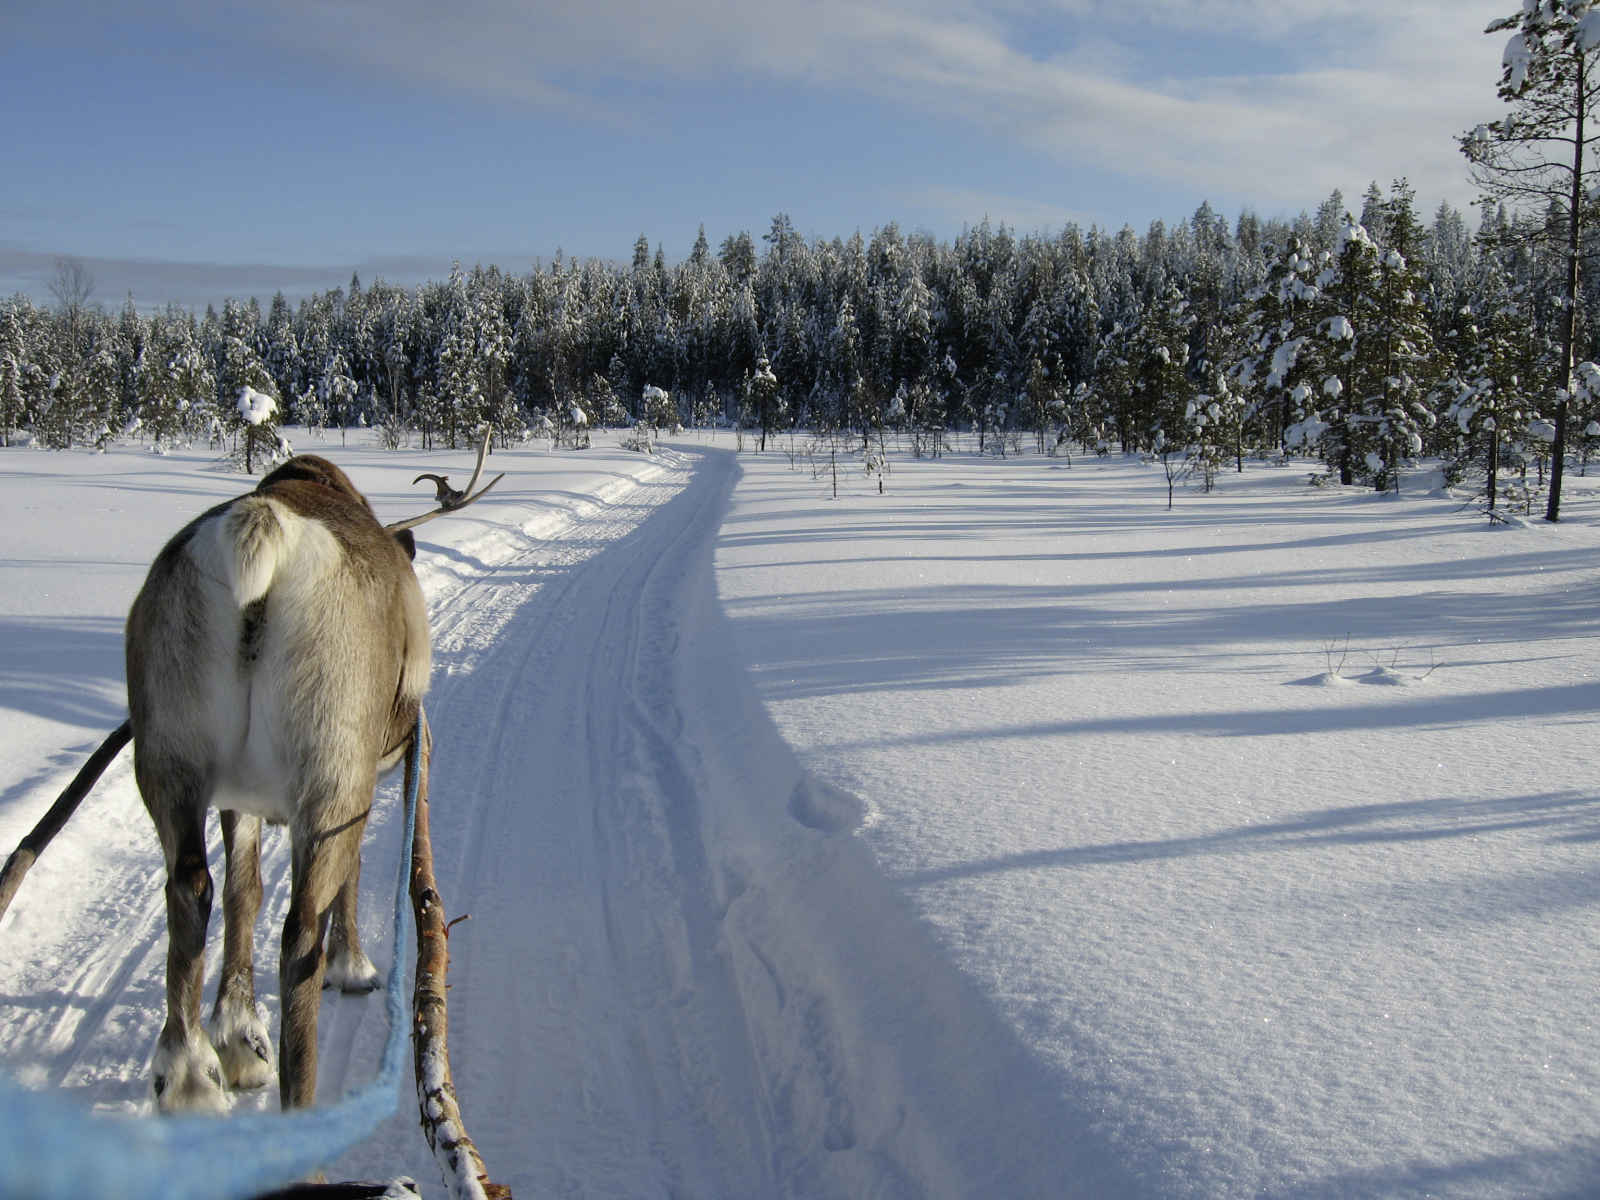 Finlande - Laponie - Meltosjärvi - Auberge de Loma Vietonen